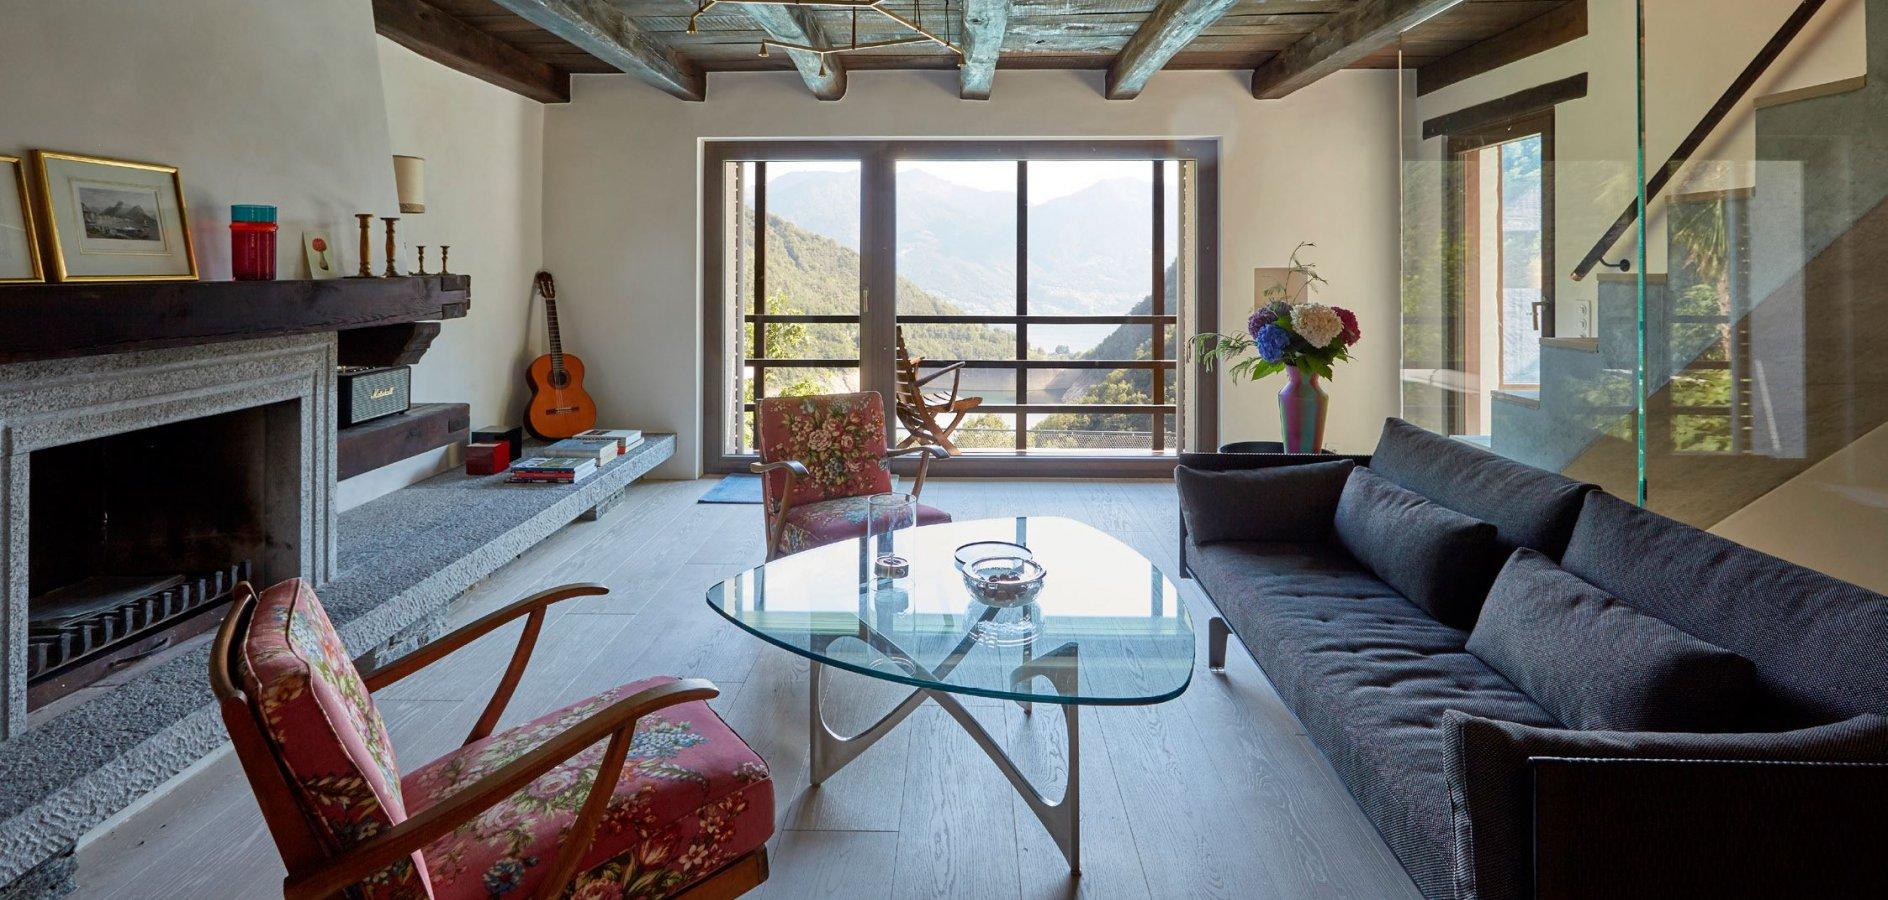 Residence, exterior, design, architecture